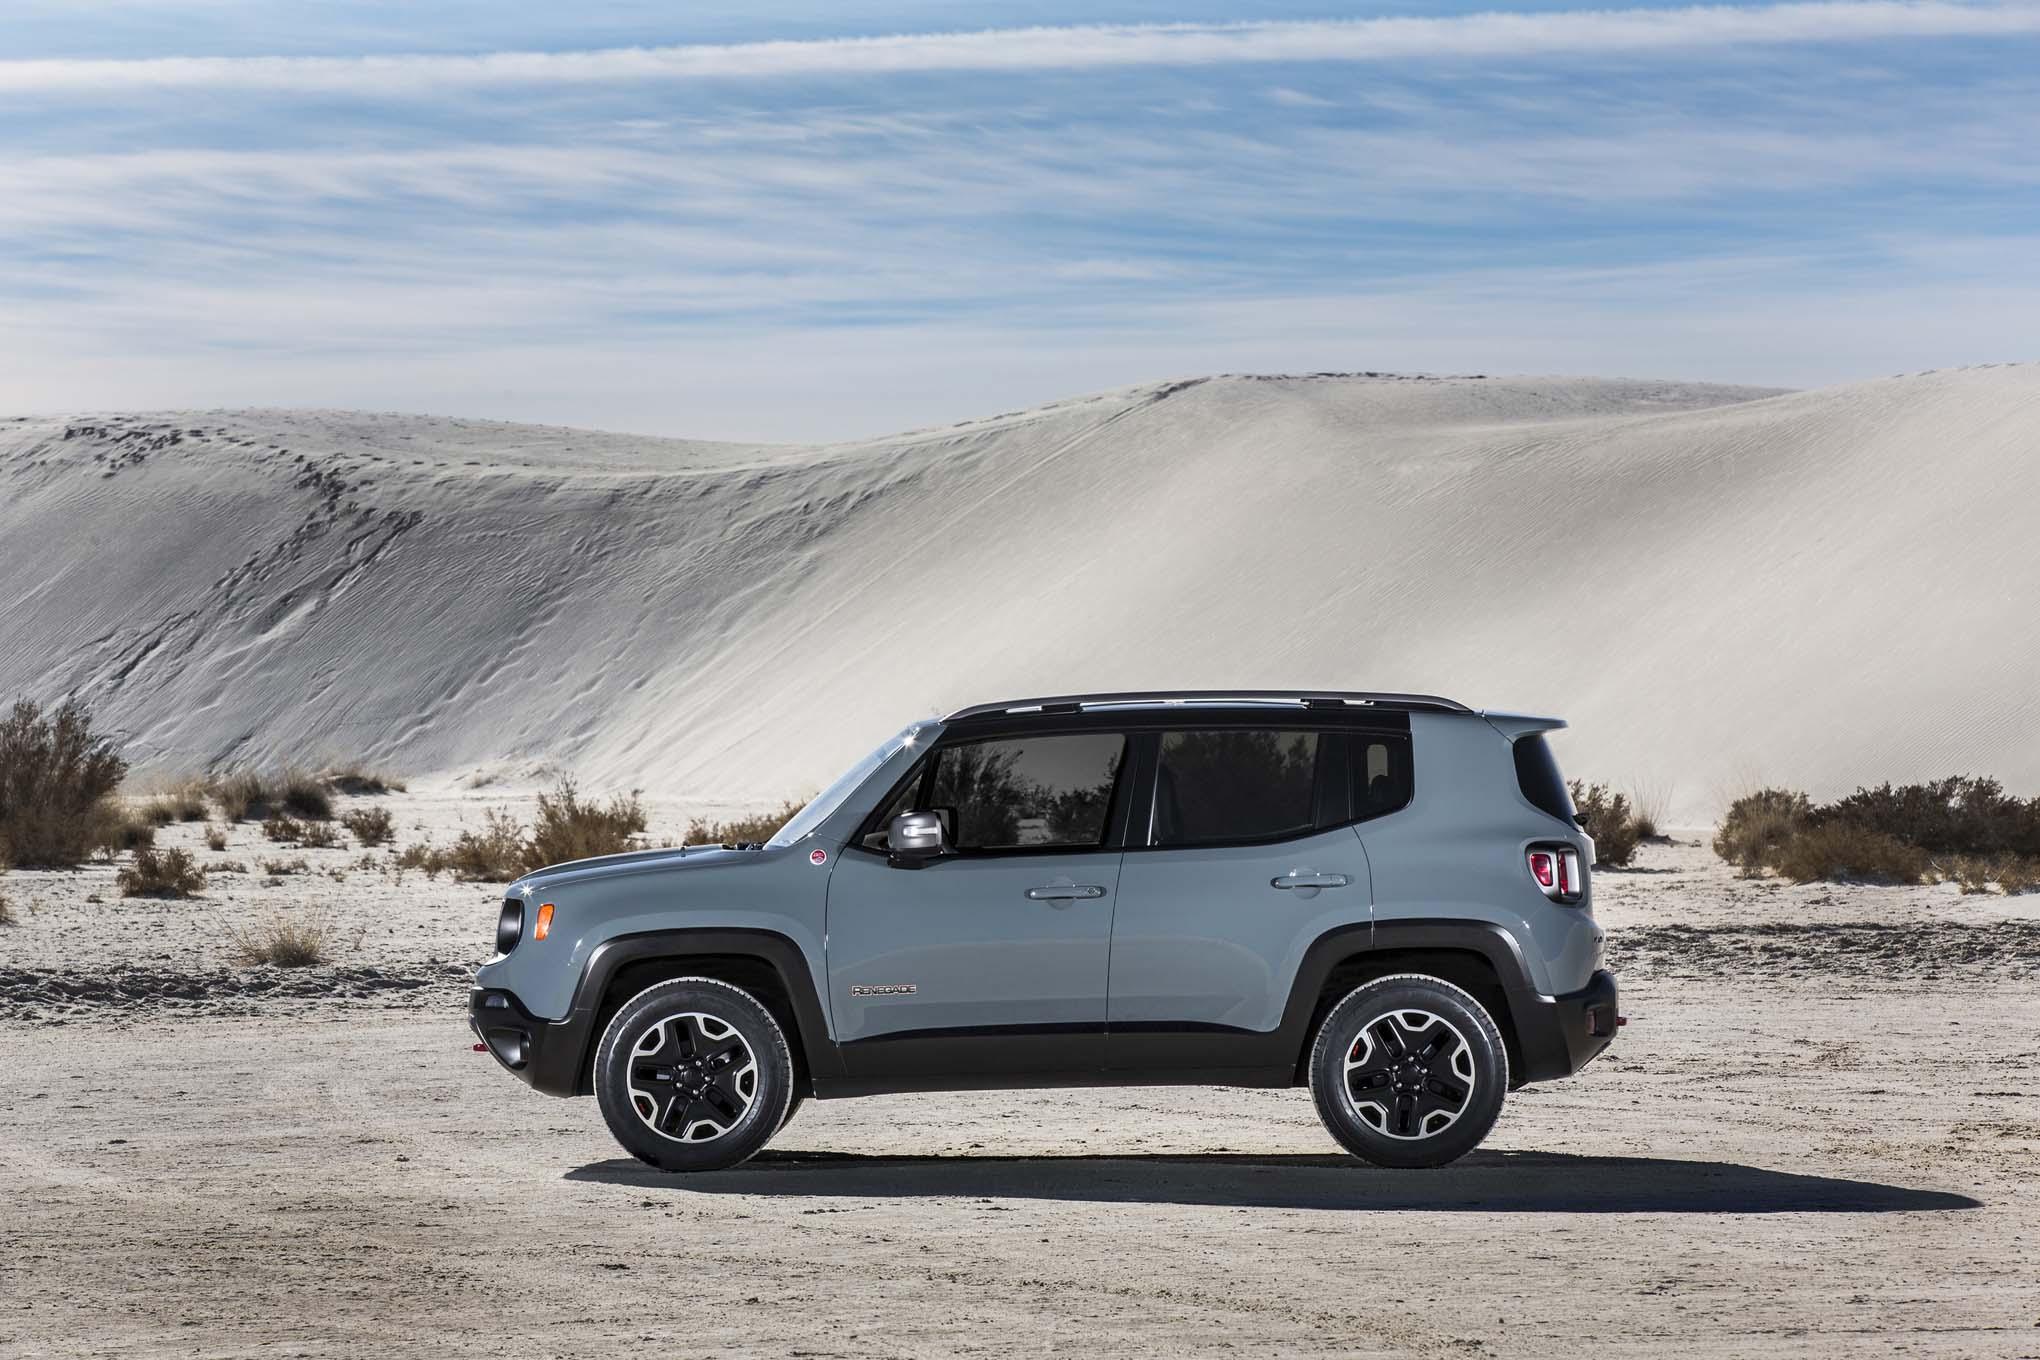 2015 Jeep Renegade Trailhawk Side View